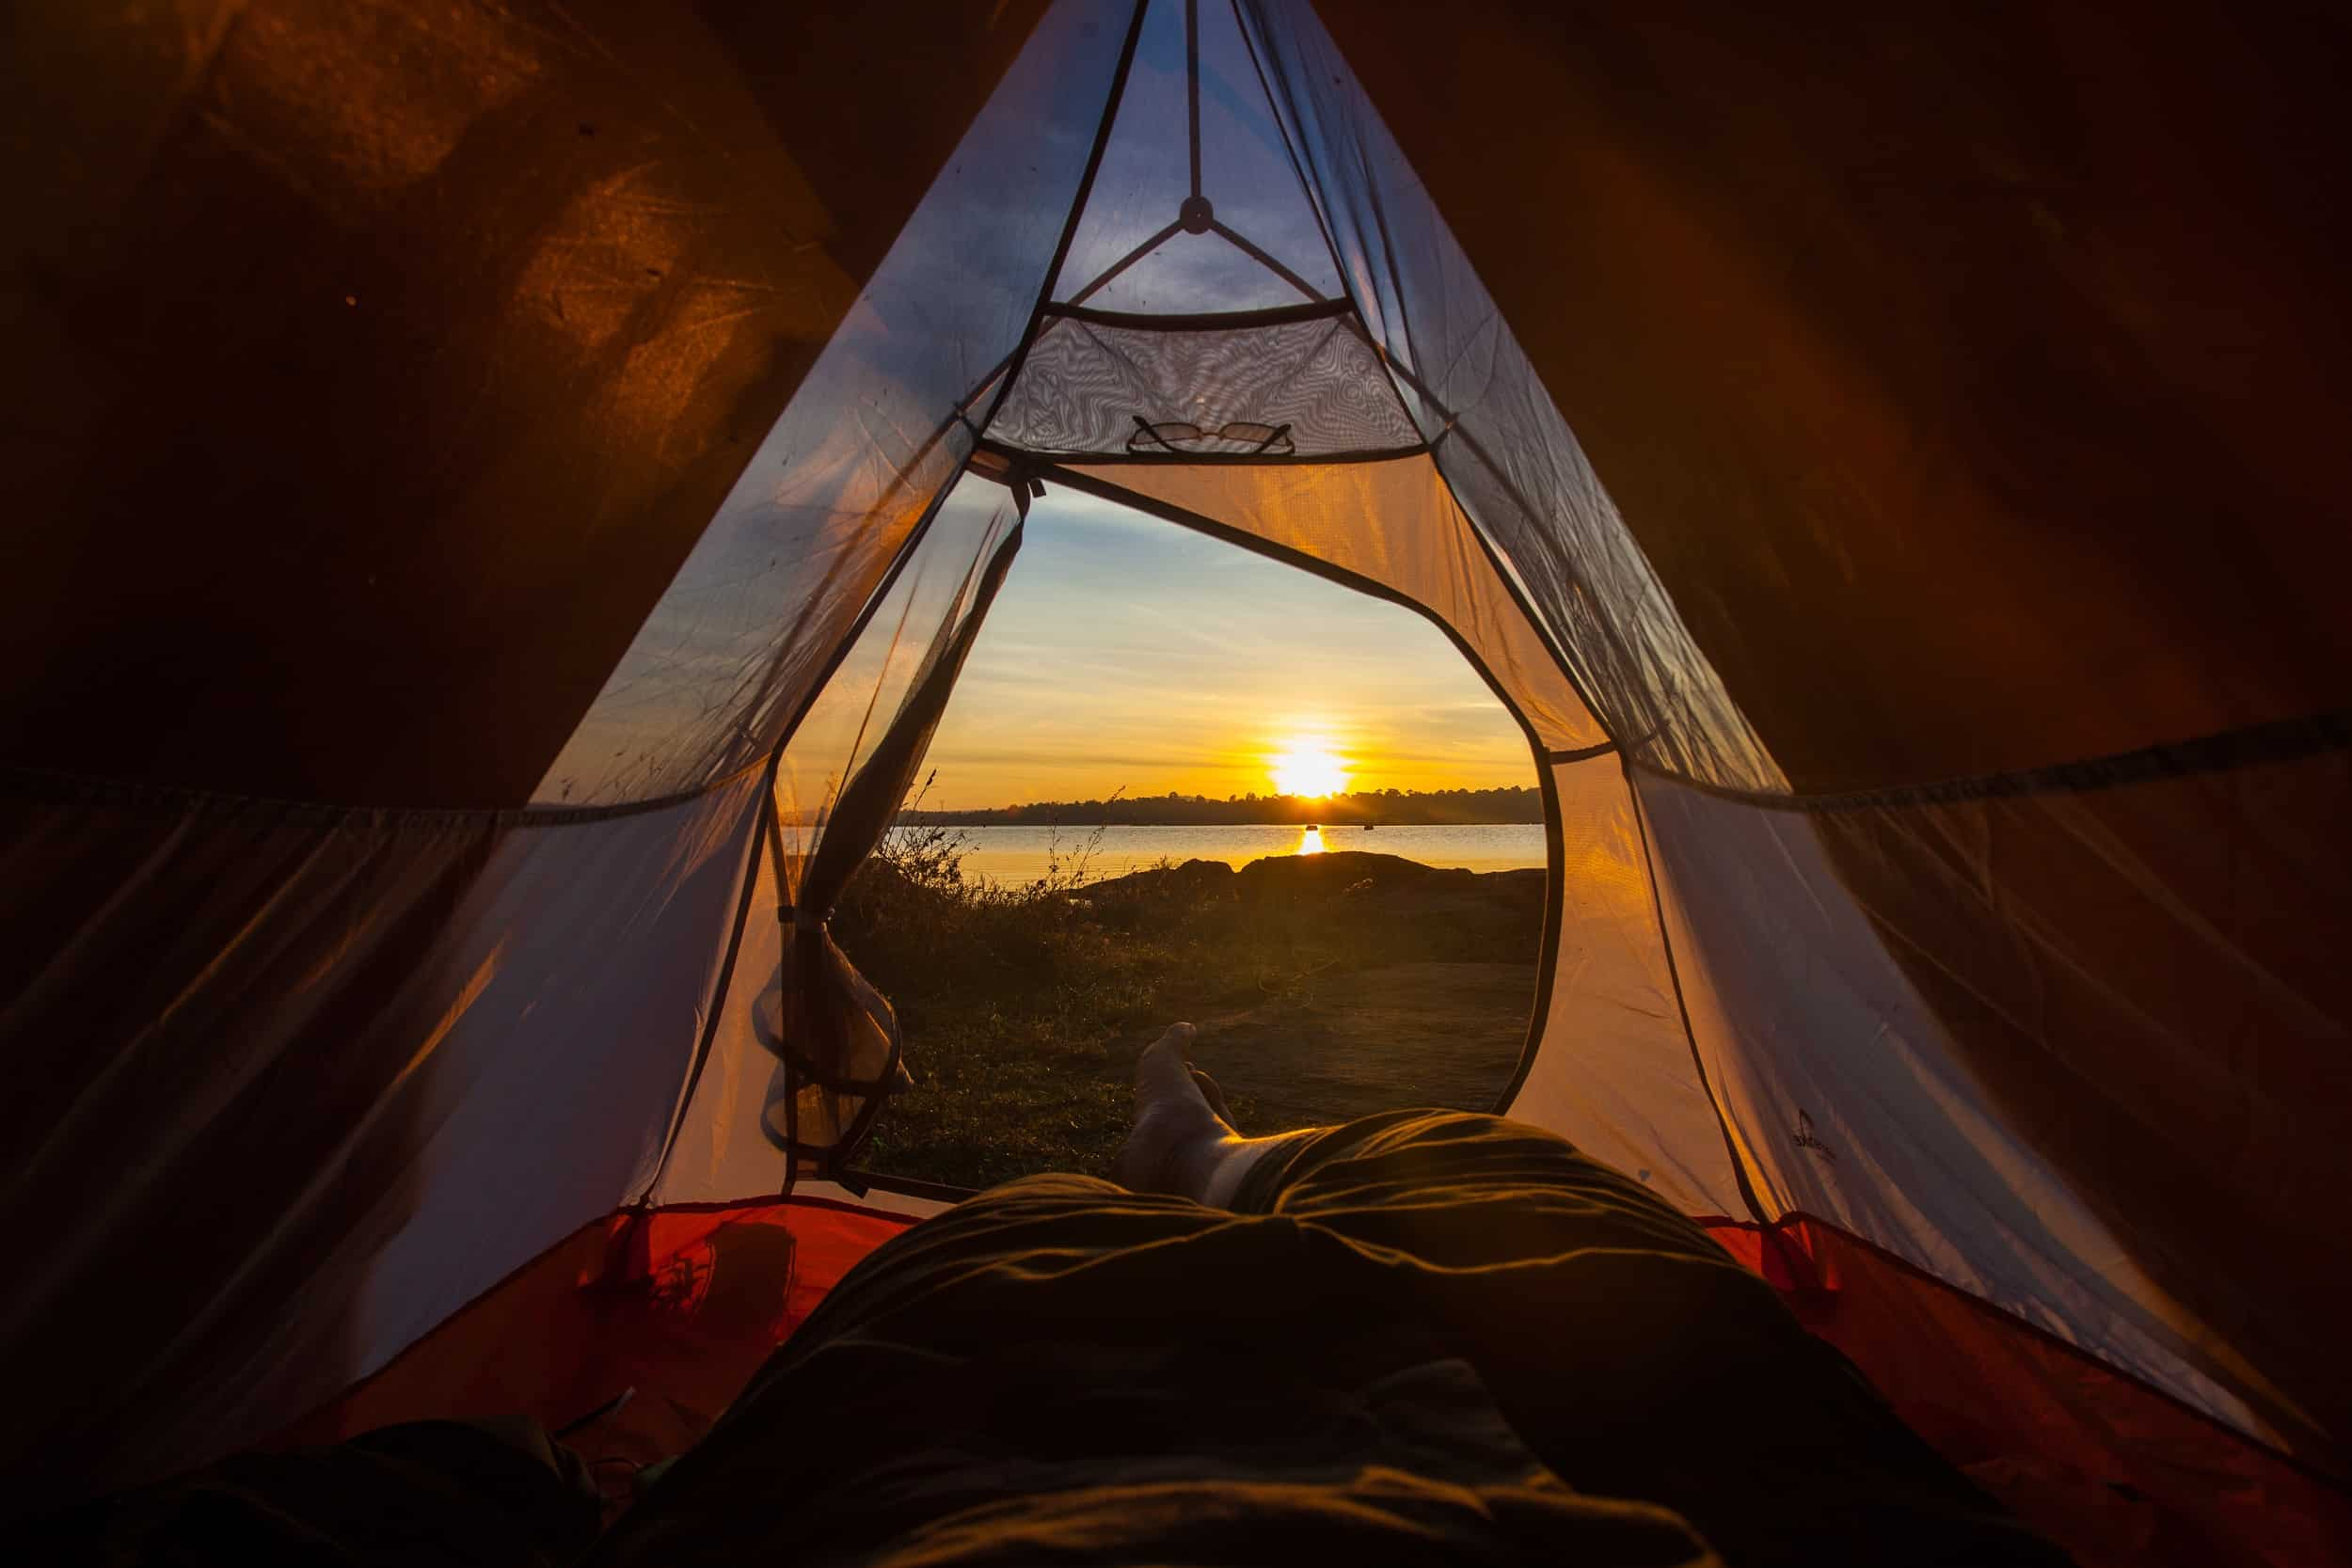 50 Free Places To Camp In Ontario - Explore Magazine